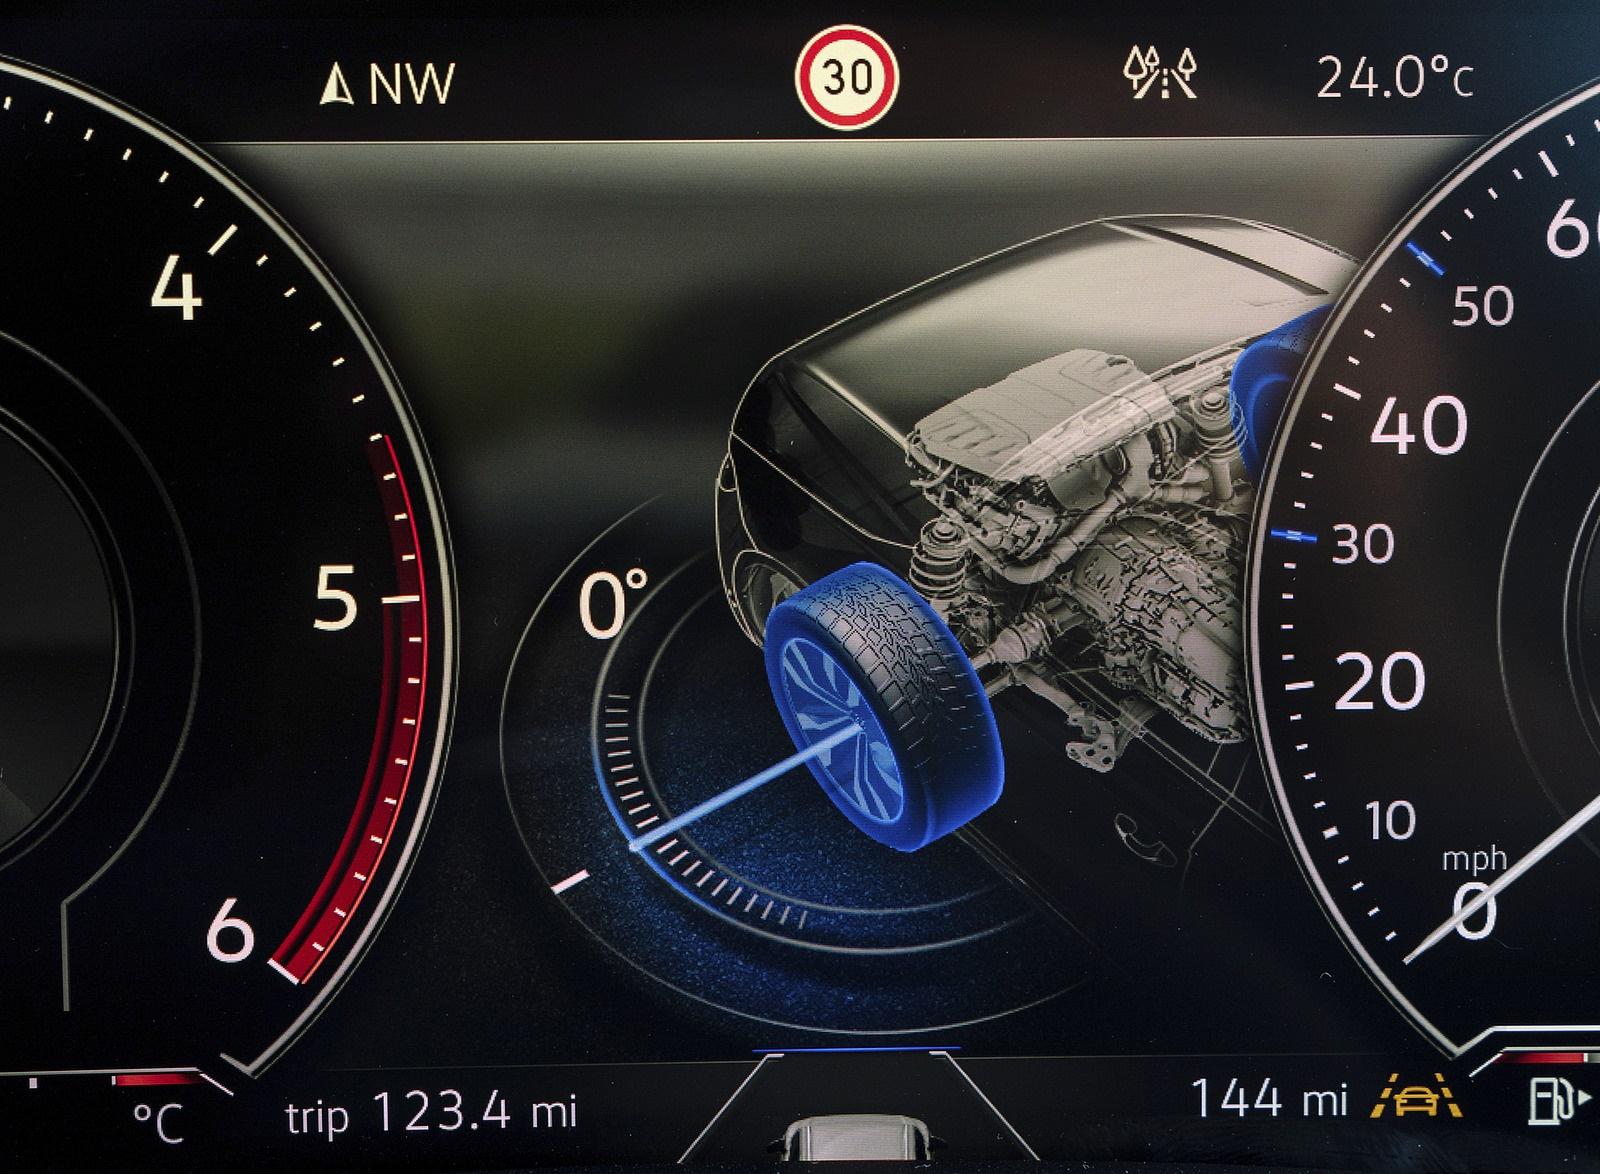 2019 Volkswagen Touareg V6 TDI R-Line (UK-Spec) Digital Instrument Cluster Wallpaper #40 of 43